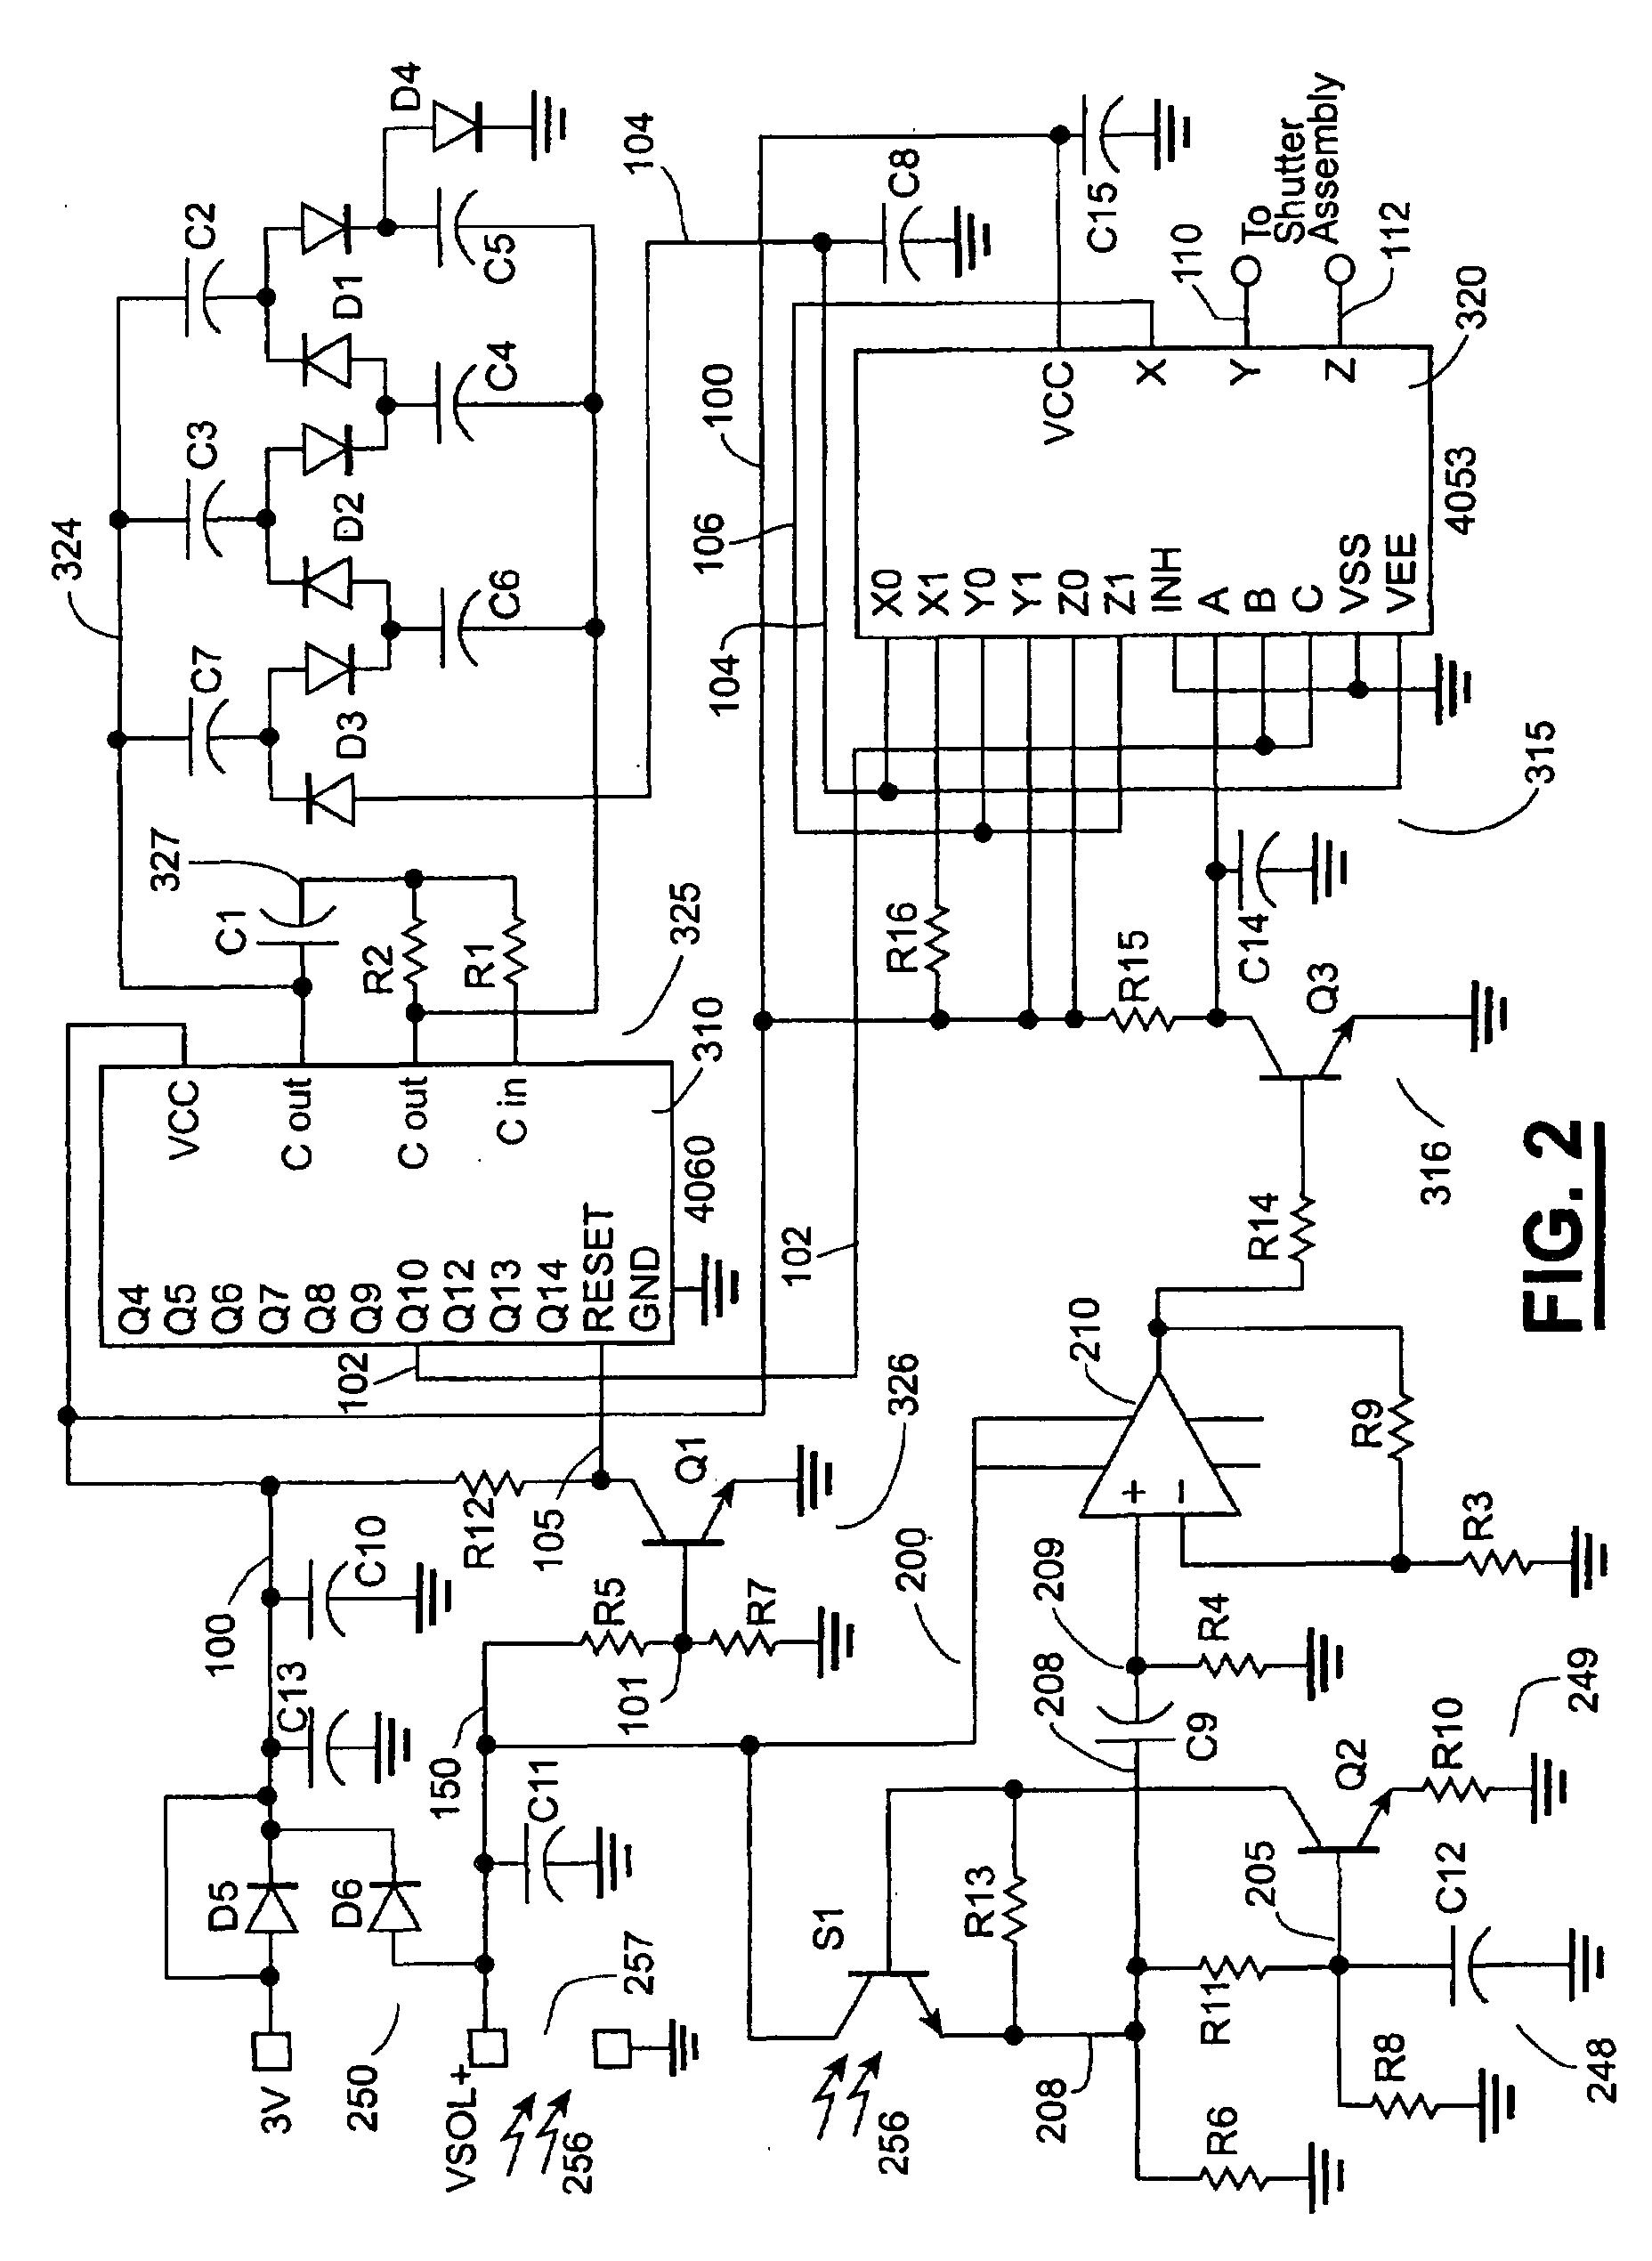 patent ep1190689a2 - phototransistor-based welding helmet